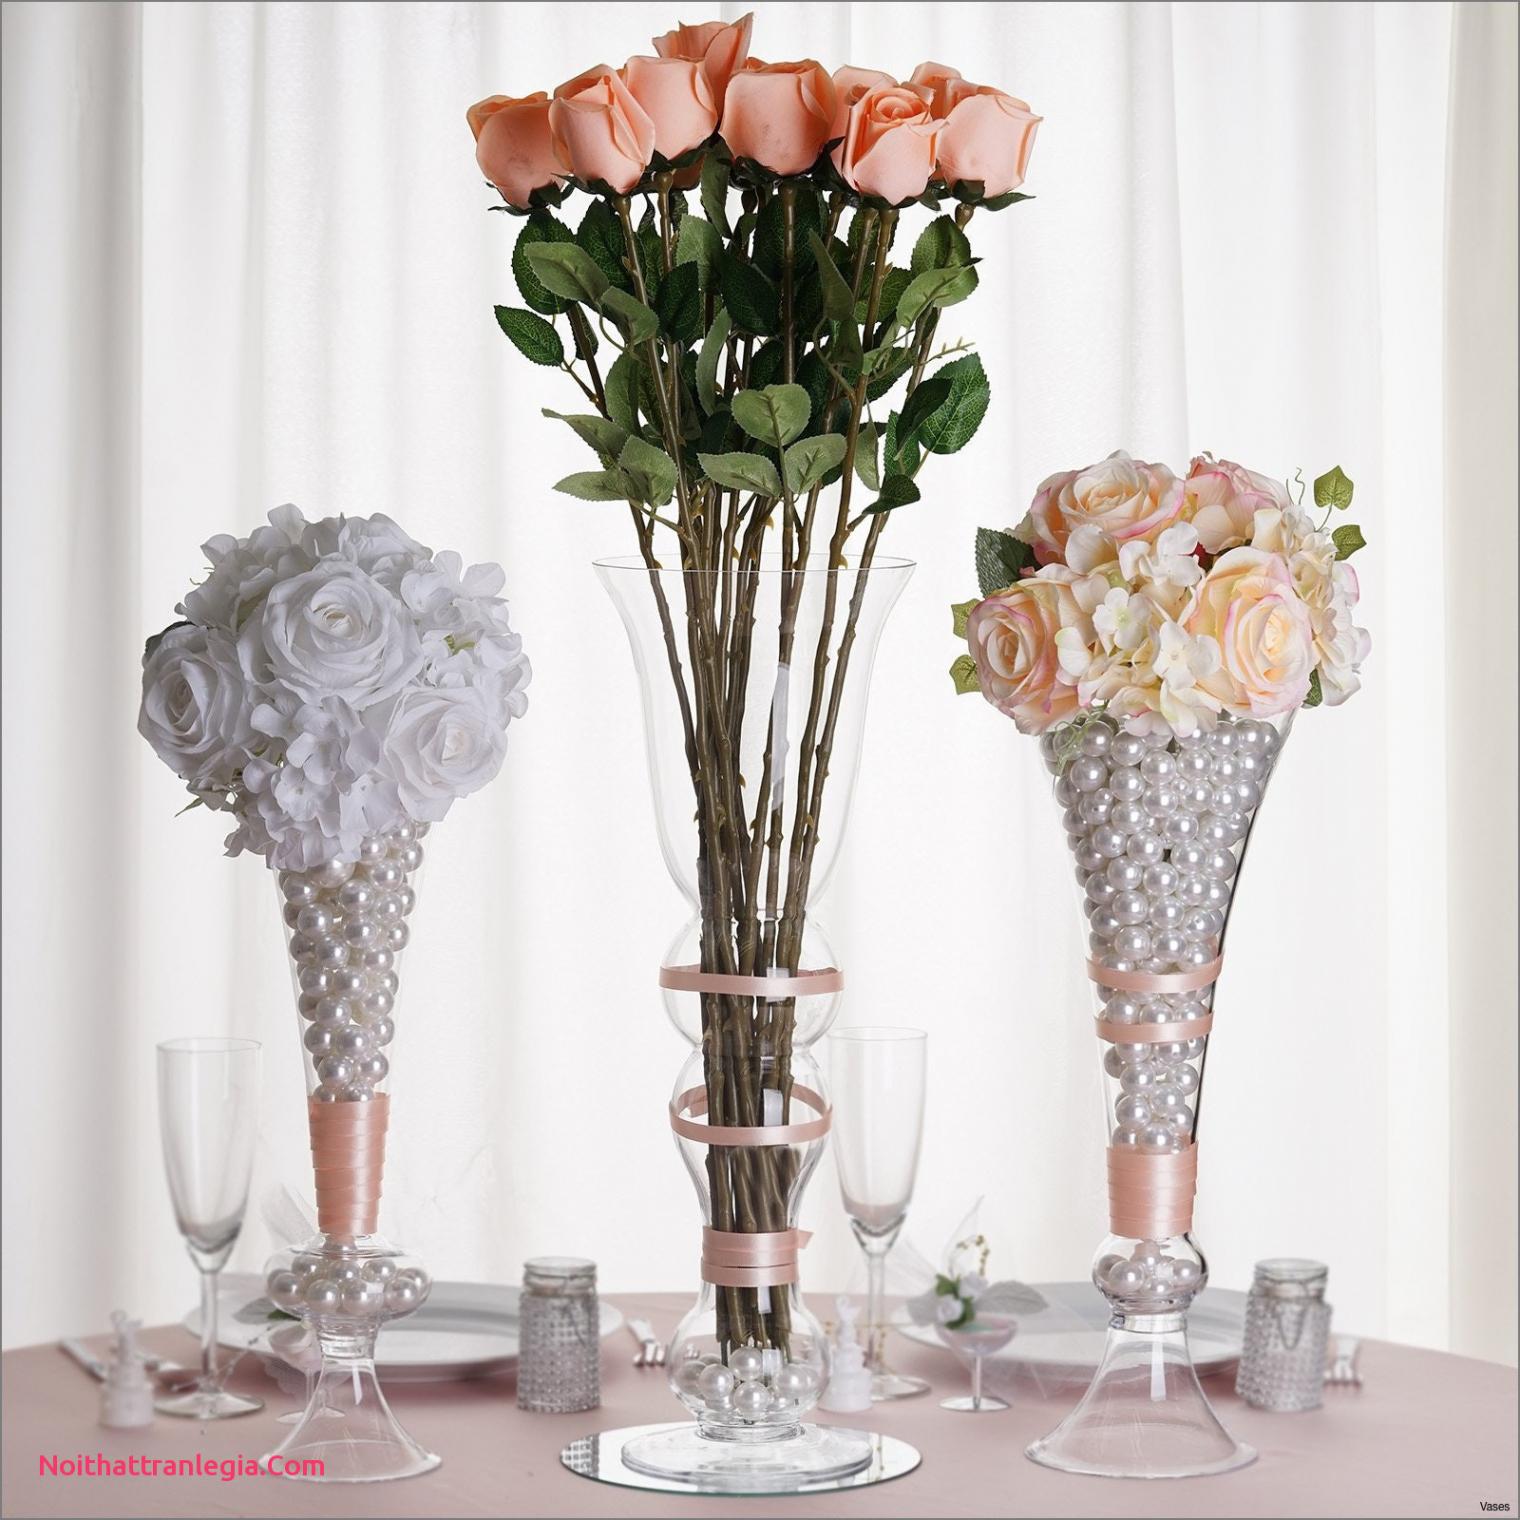 10 popular square flower vases wholesale vase selber machen vase selber machen